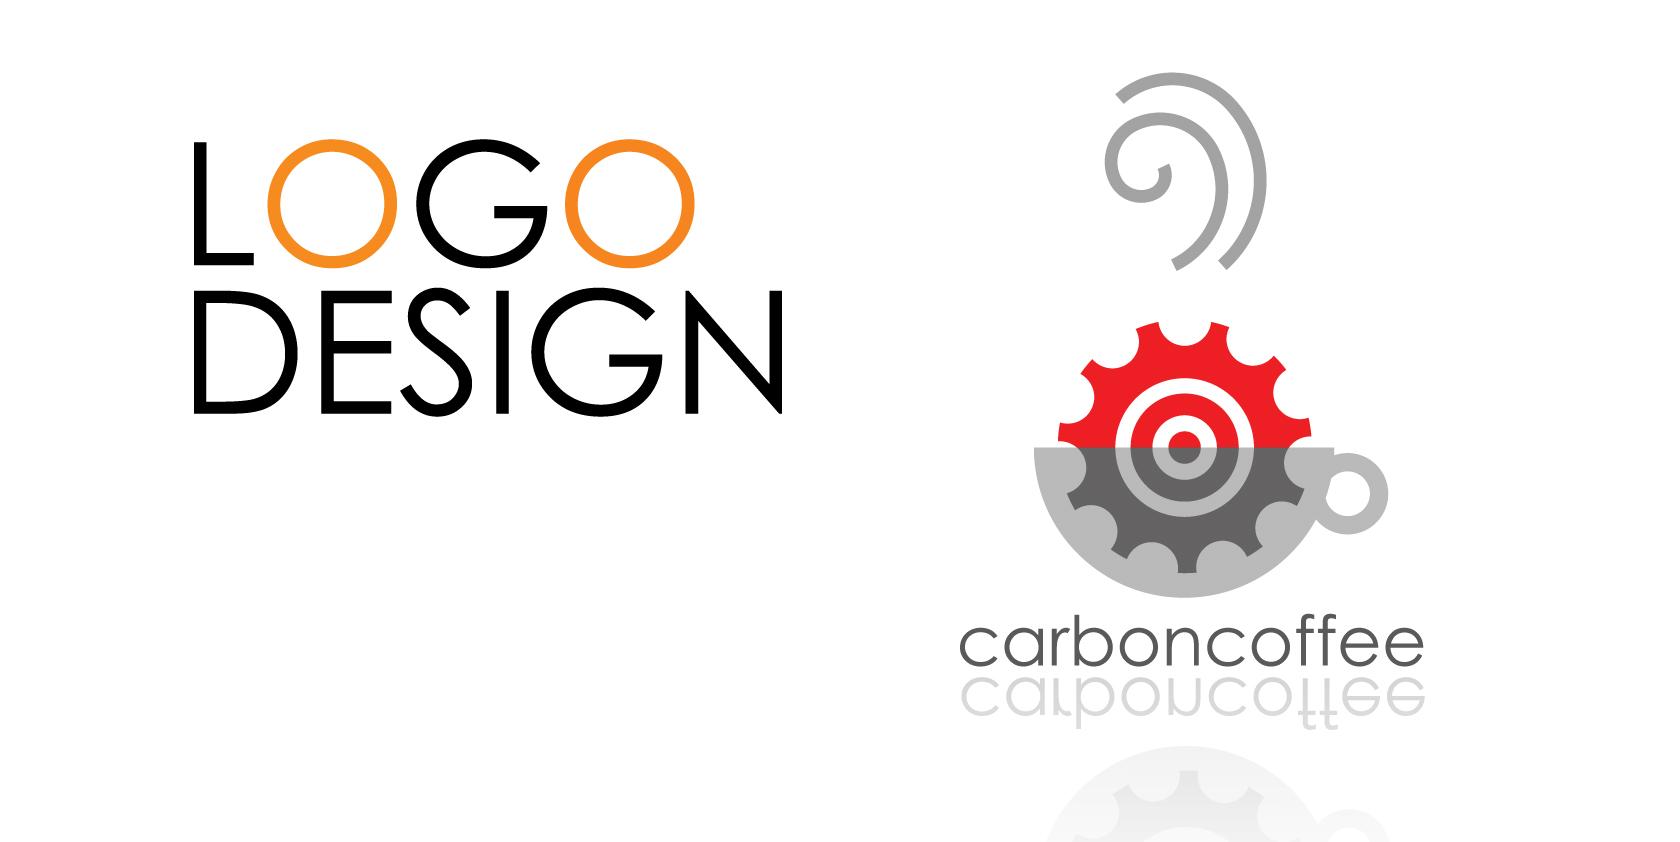 PROFESSIONAL LOGO DESIGN – Adobe Illustrator CS6 (carbon coffee)